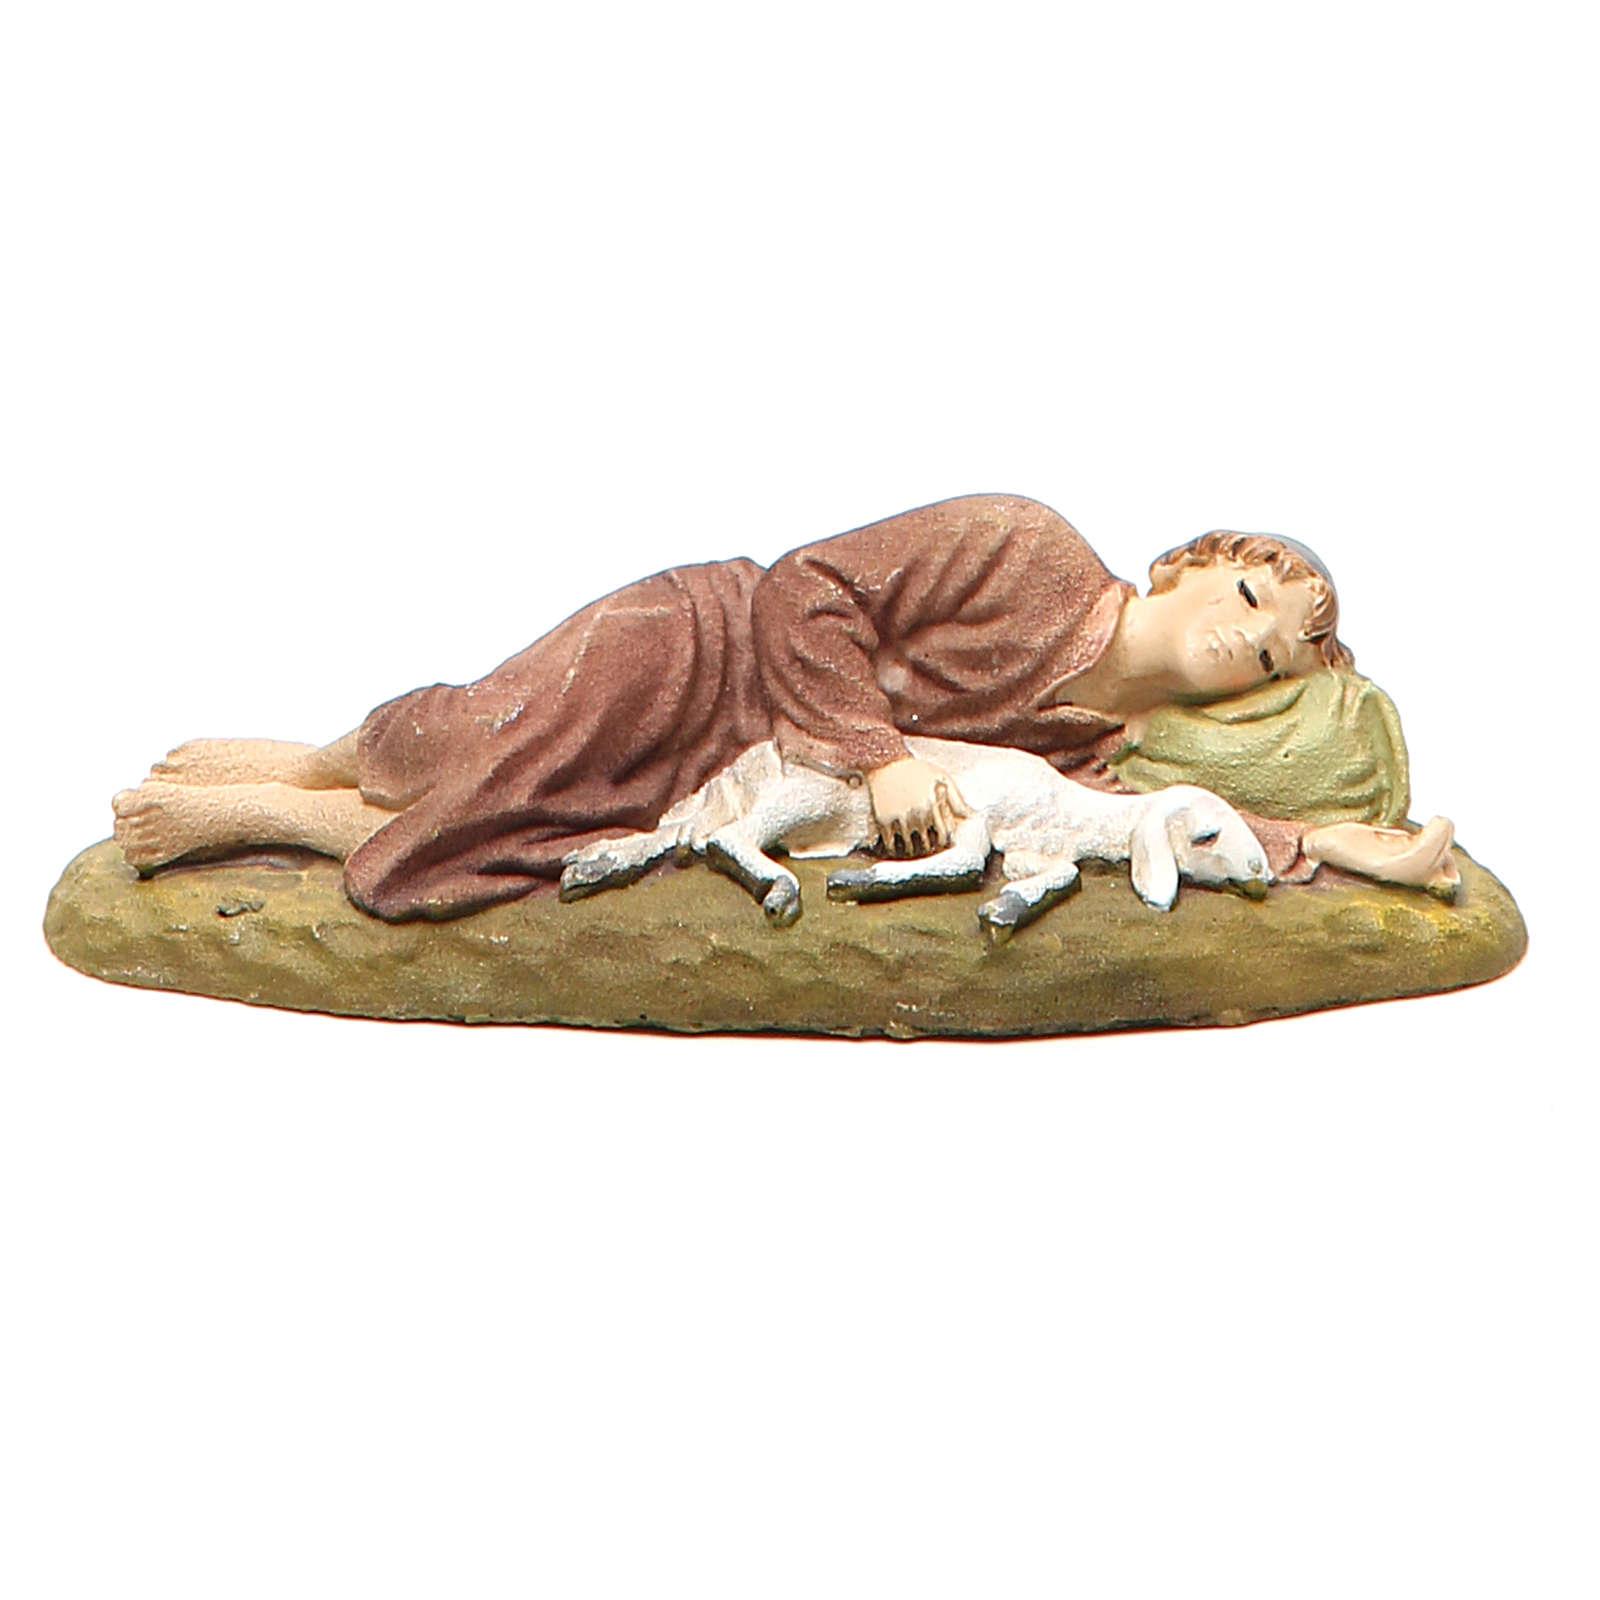 Pastore dormiente resina dipinta cm 10 Linea Martino Landi 3